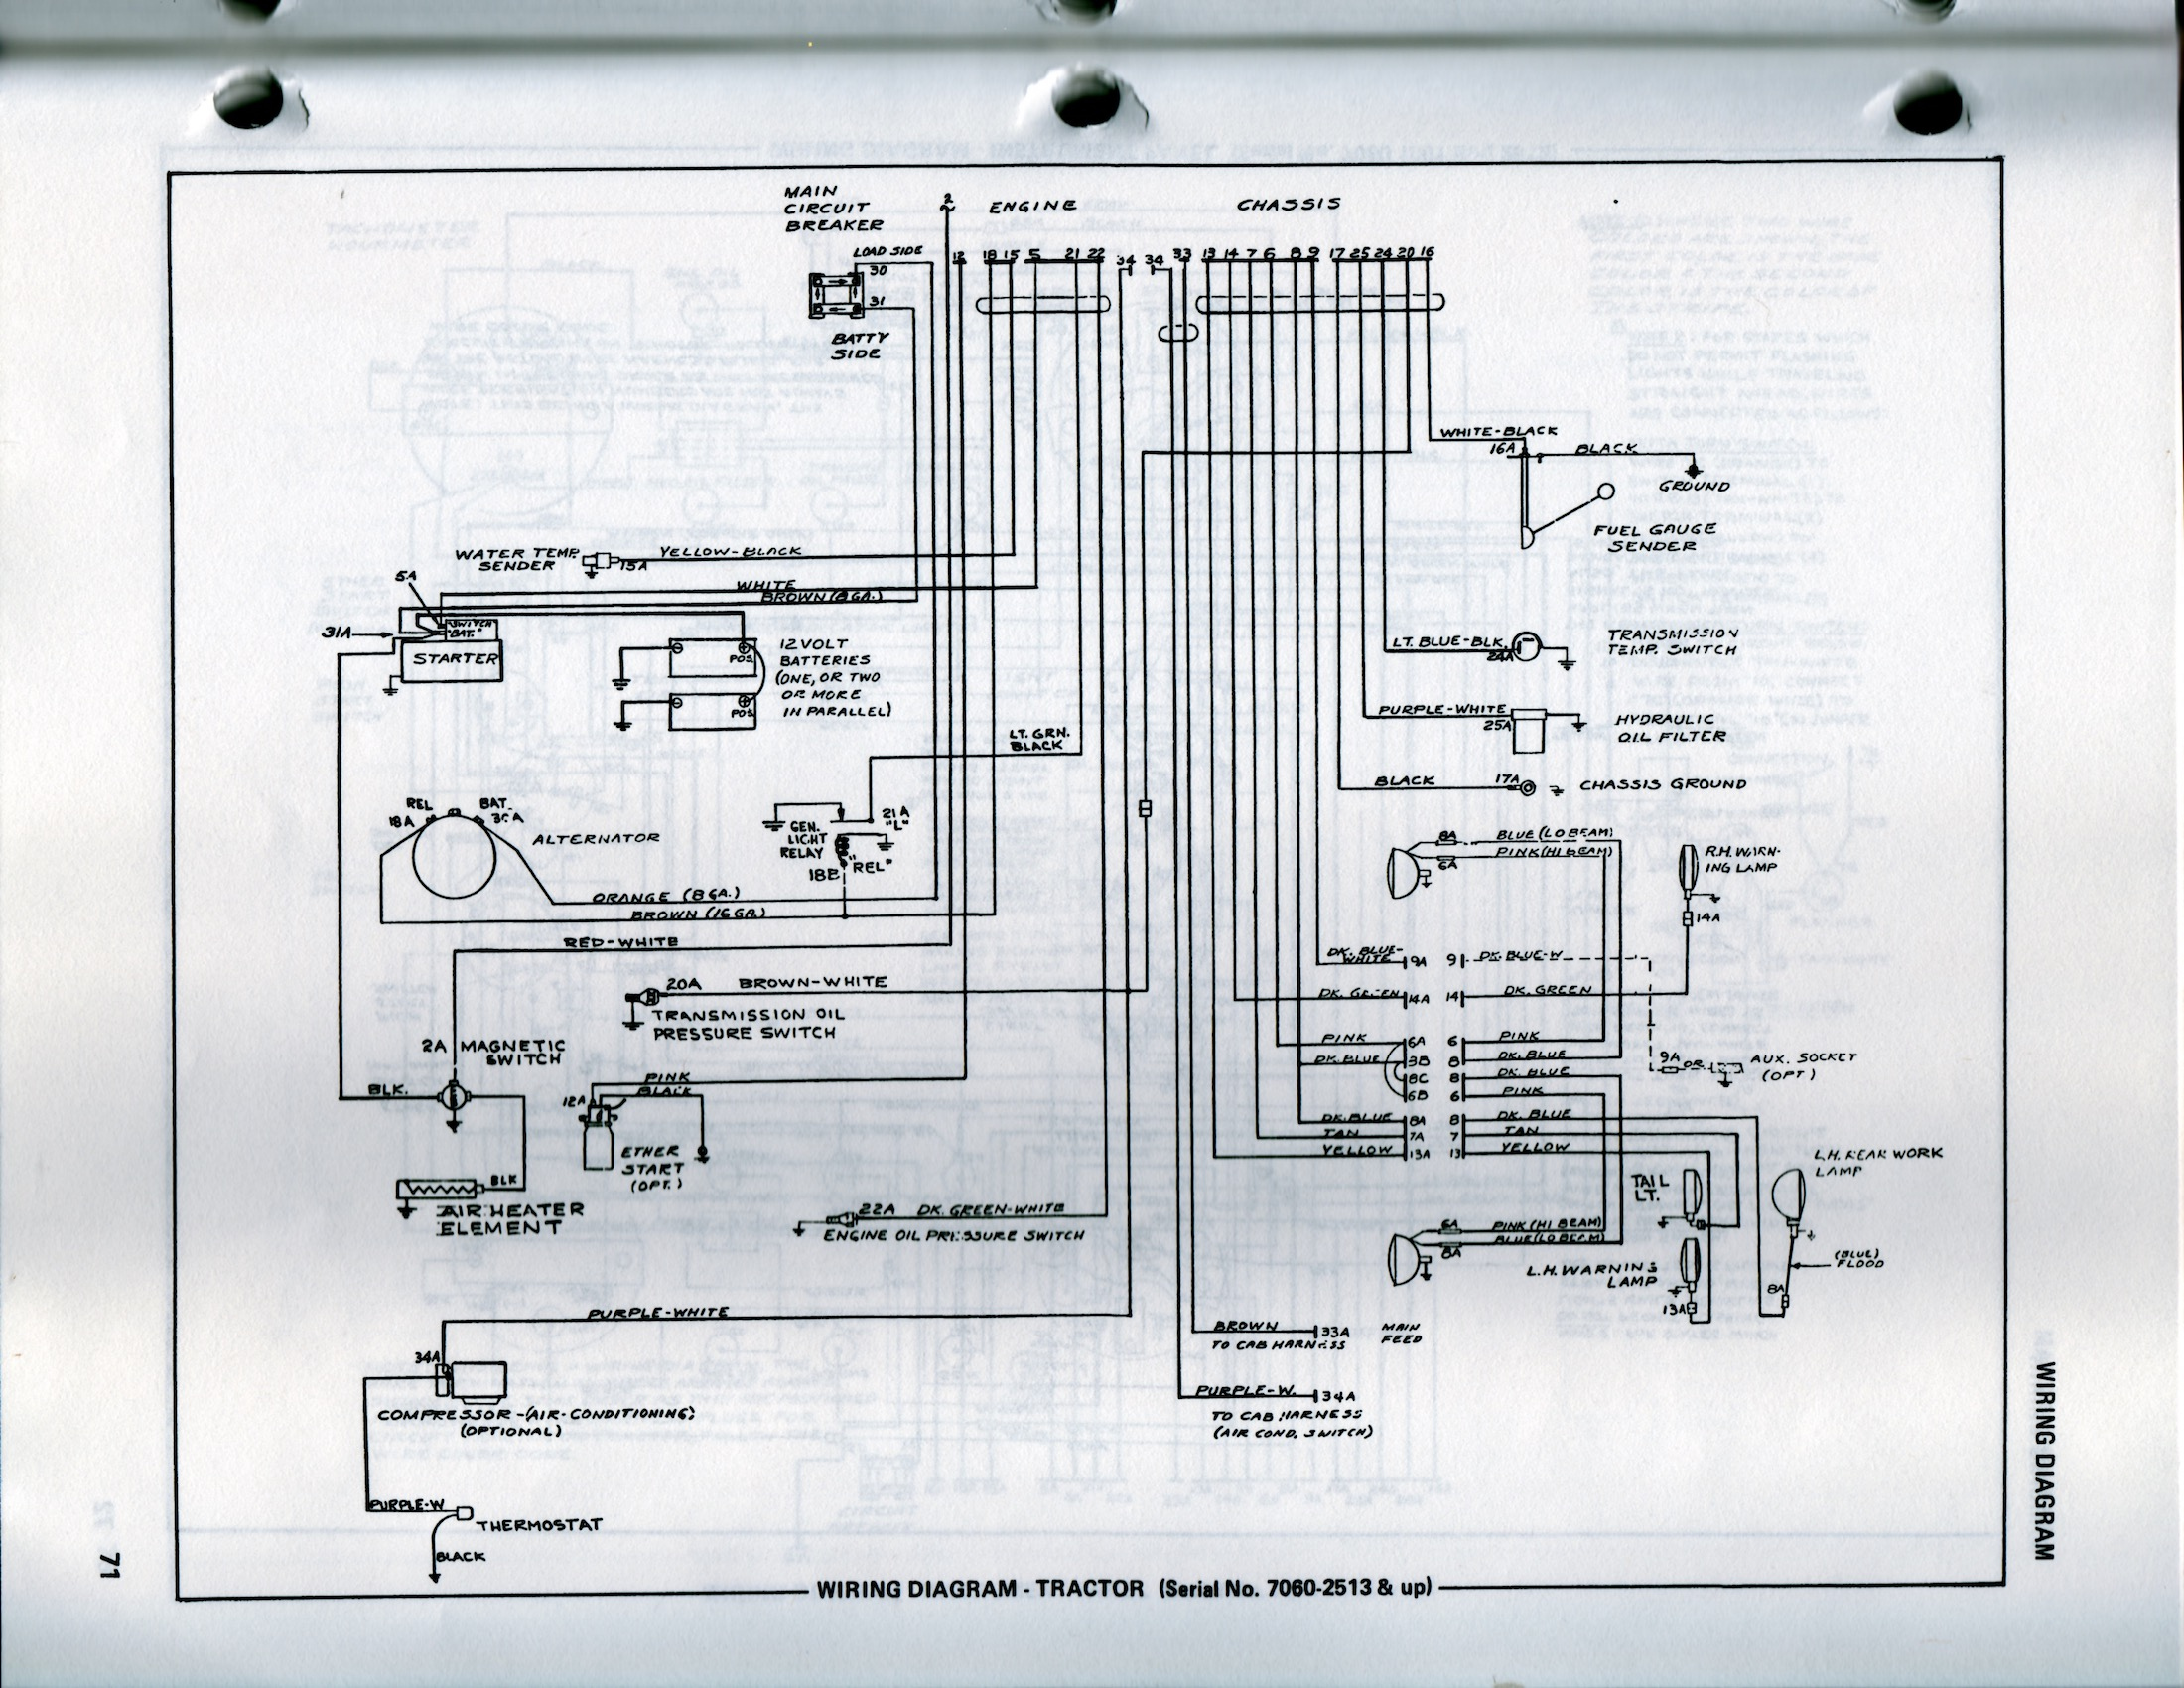 FT_3787] Alternator Wiring Diagram 170 Allis Chalmers Wiring DiagramSand Pap Hendil Mohammedshrine Librar Wiring 101